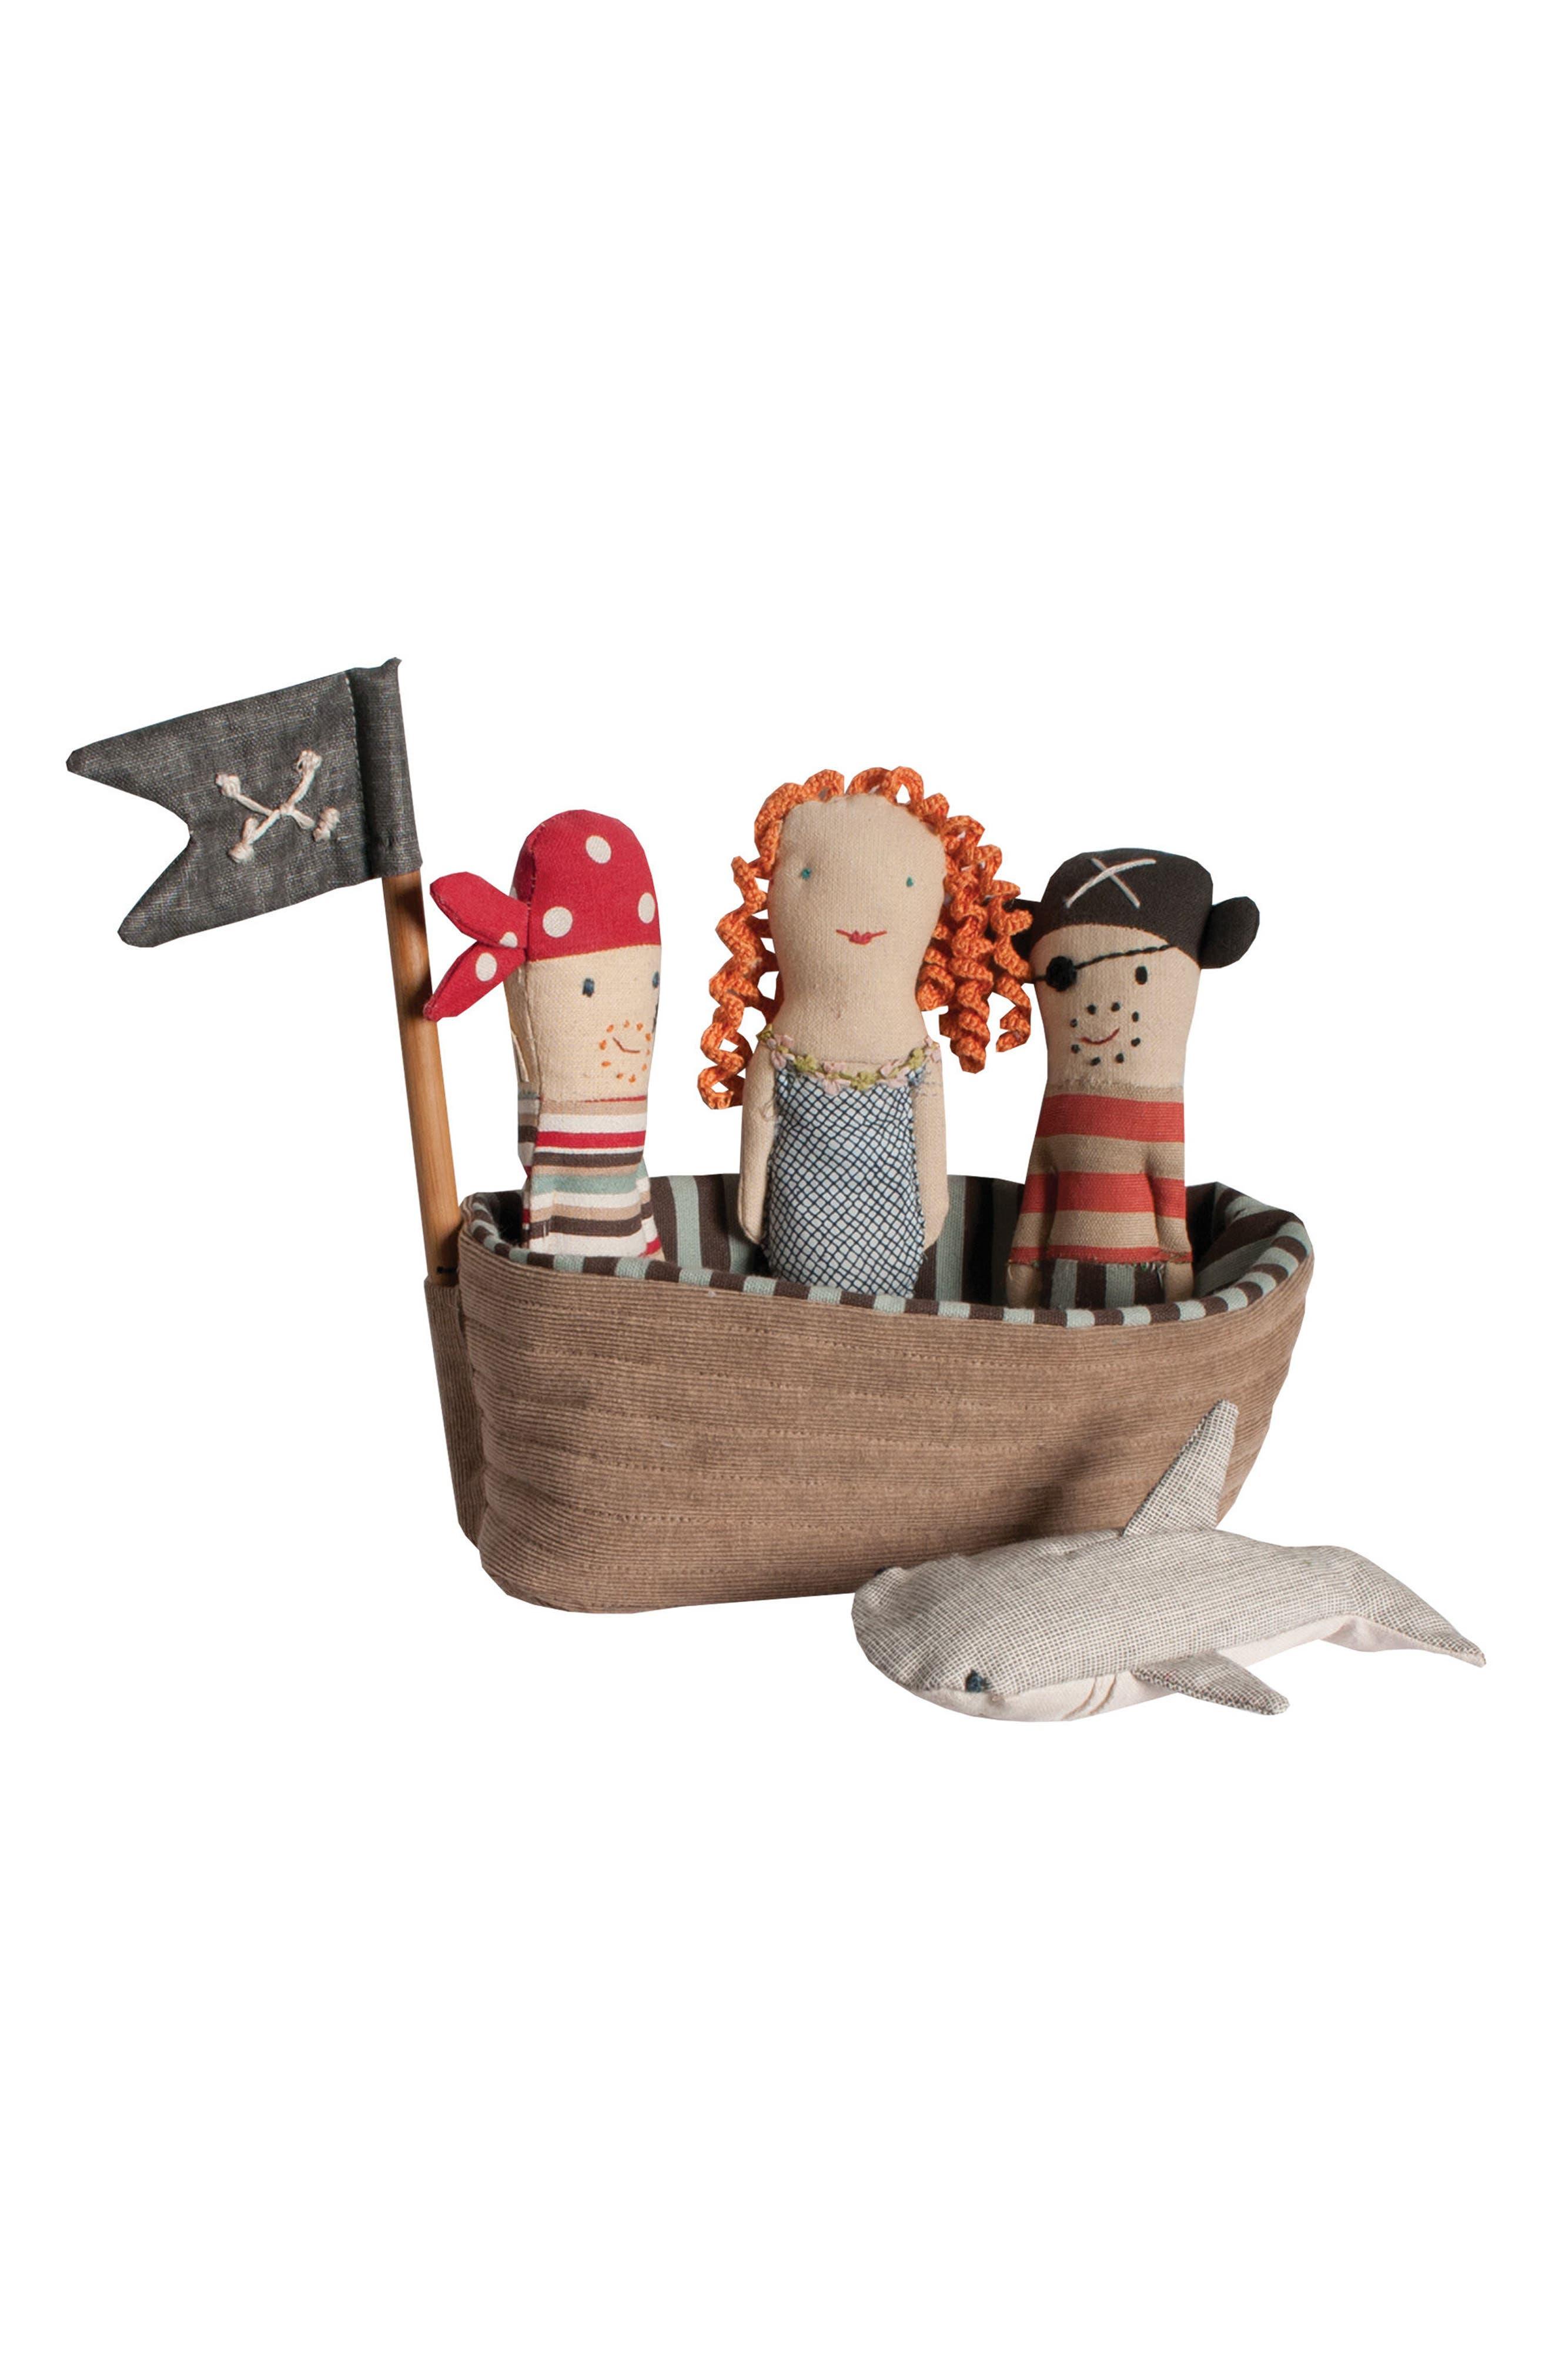 Pirate Ship Rattle 5-Piece Play Set,                             Main thumbnail 1, color,                             200